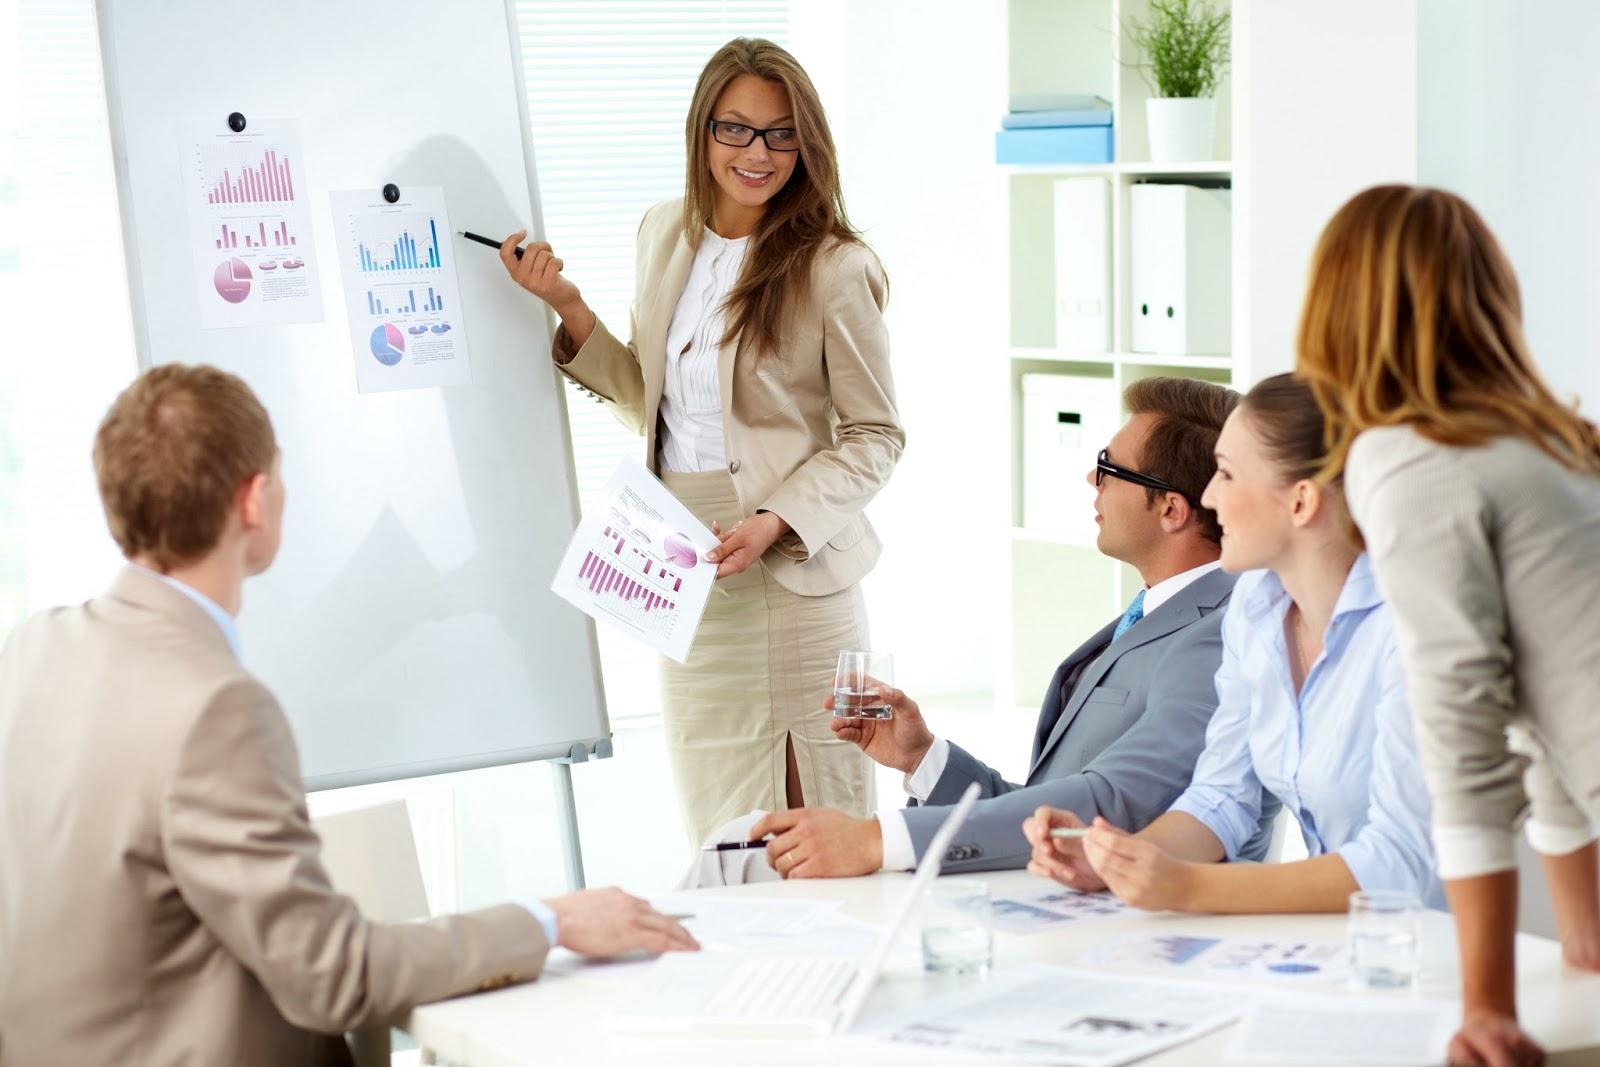 Картинки обучение бизнес